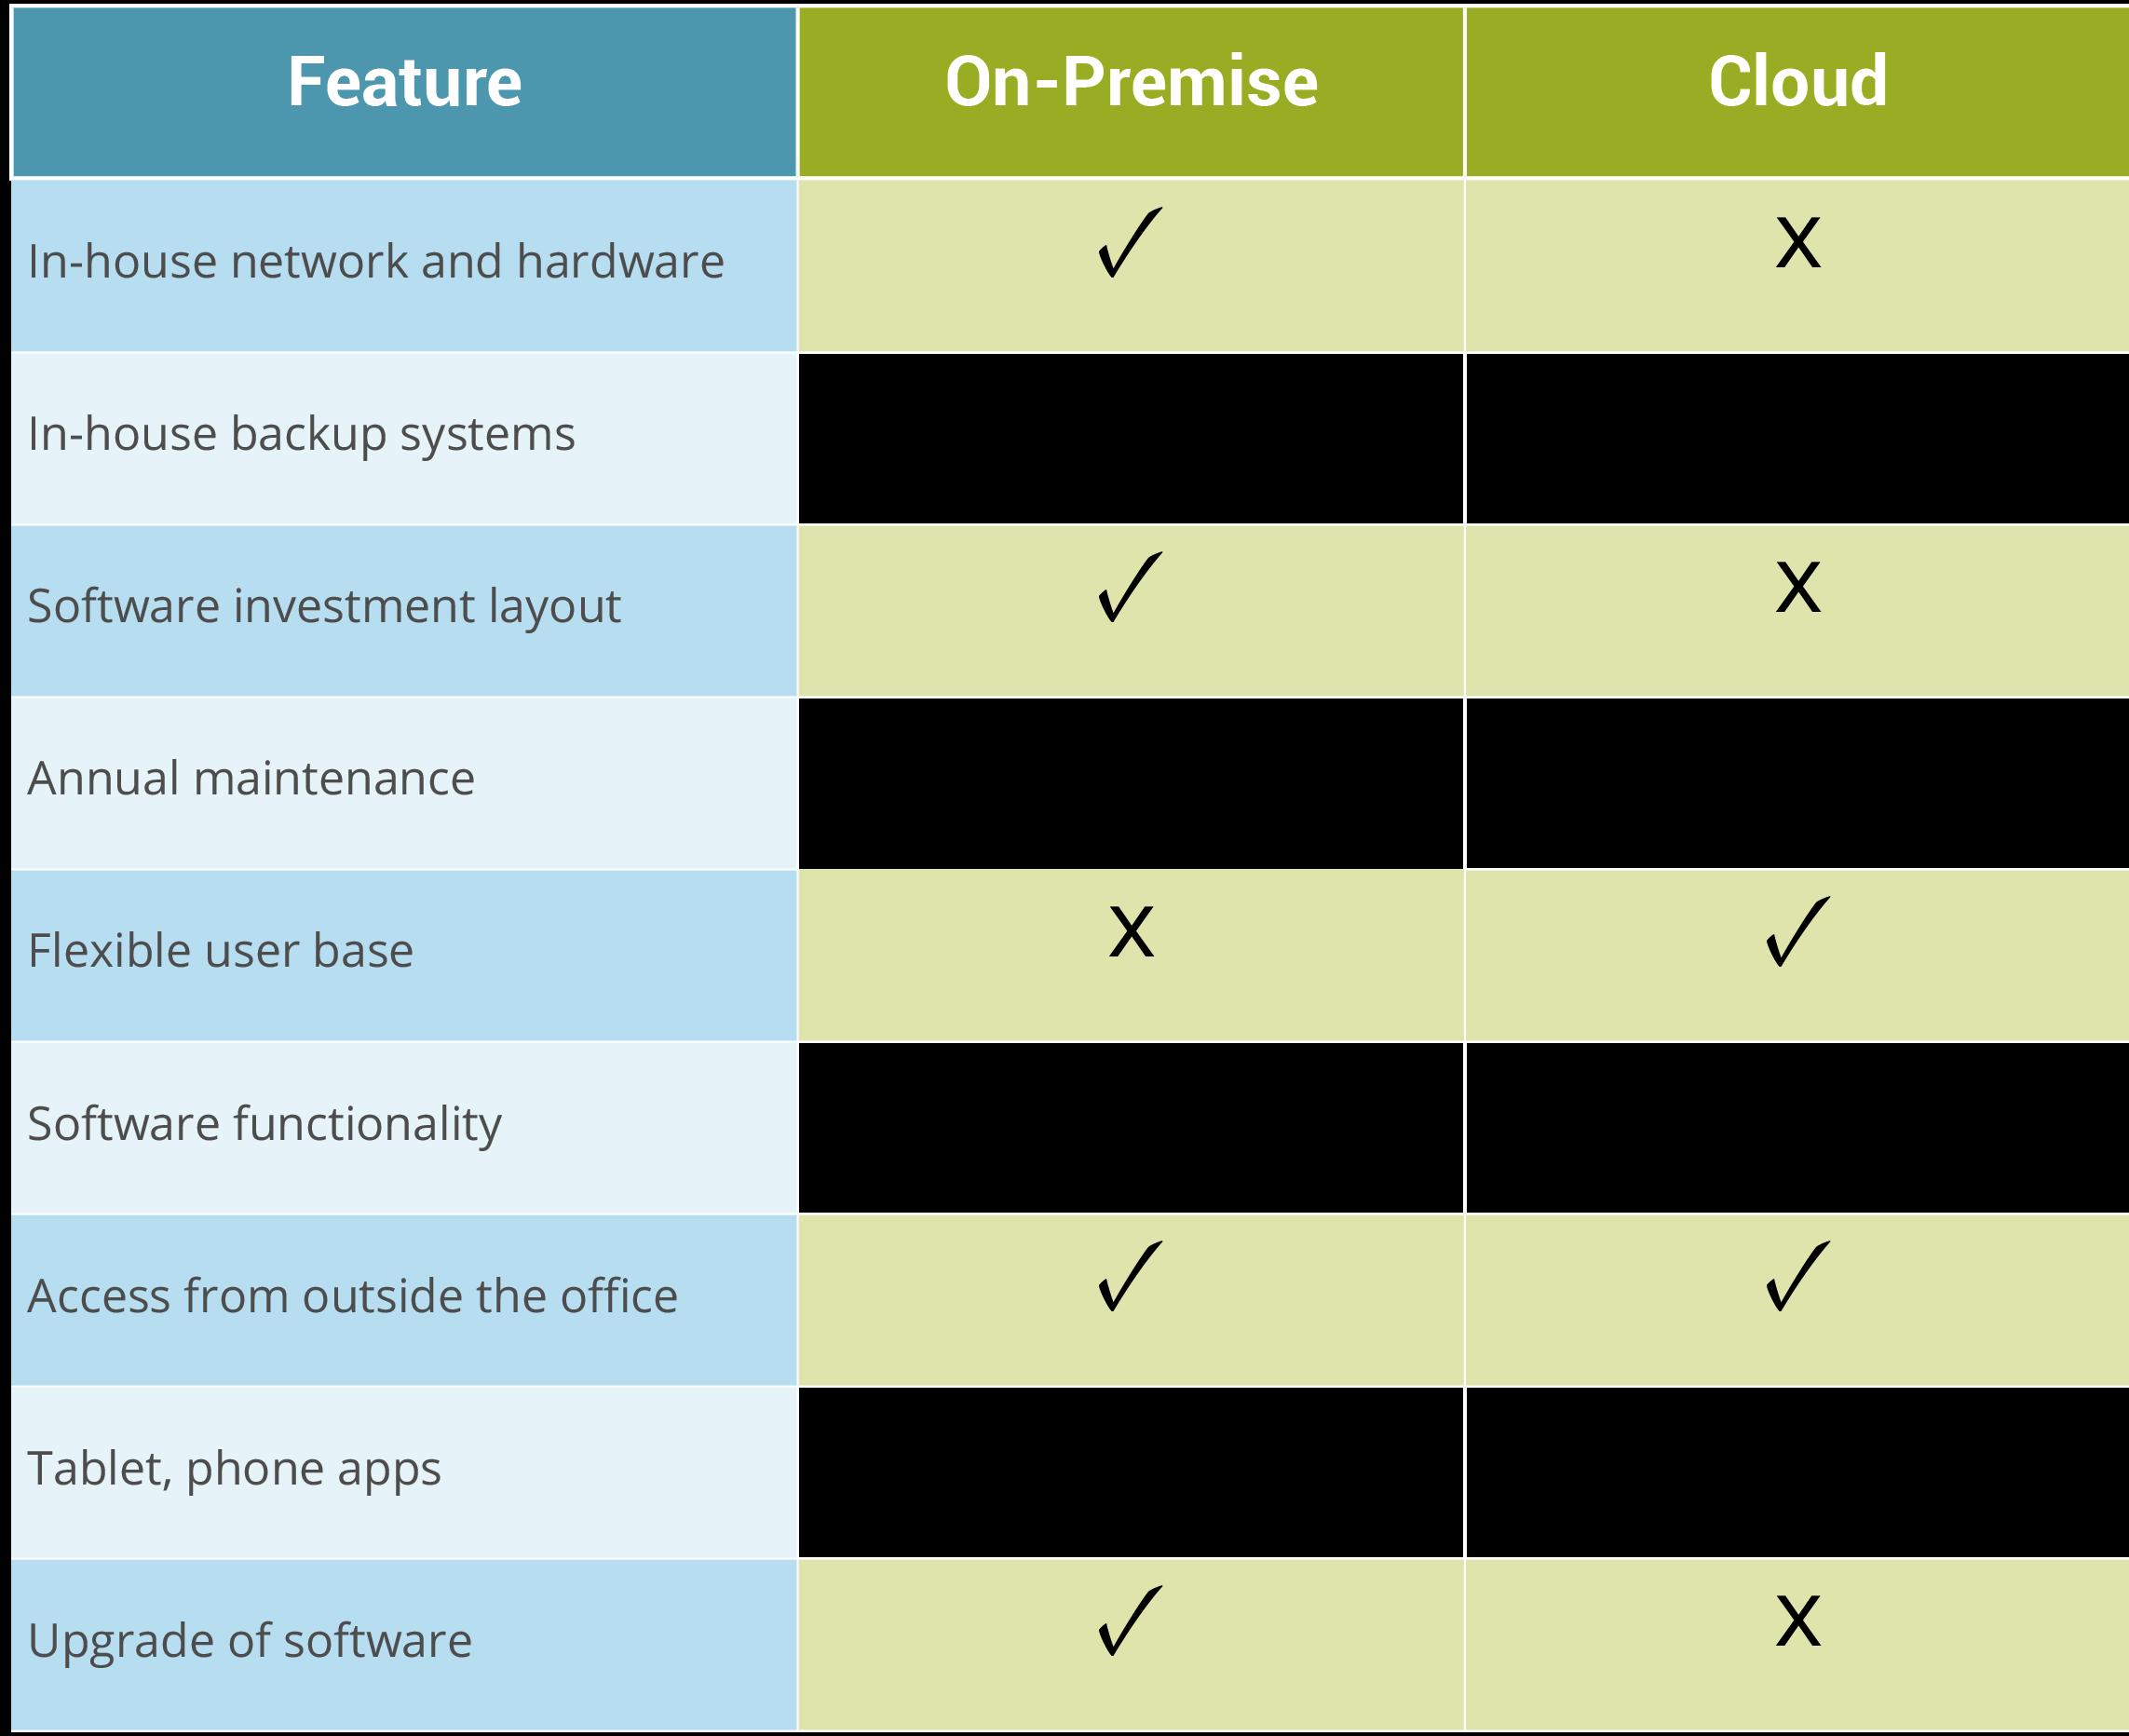 Cloud-based Computing vs. On-Premise for Wealth Management